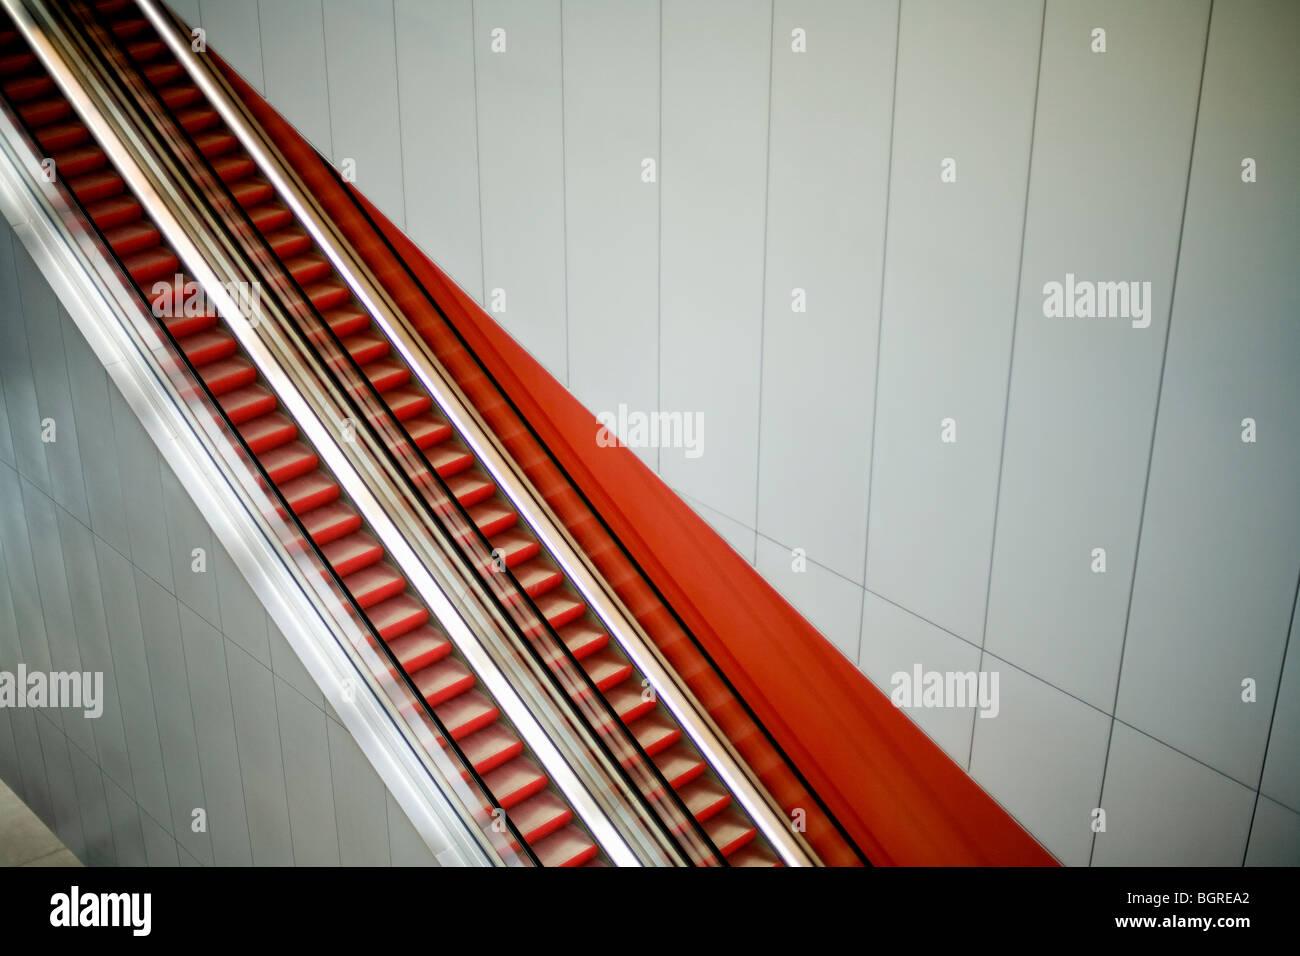 Escalator, Svezia. Immagini Stock